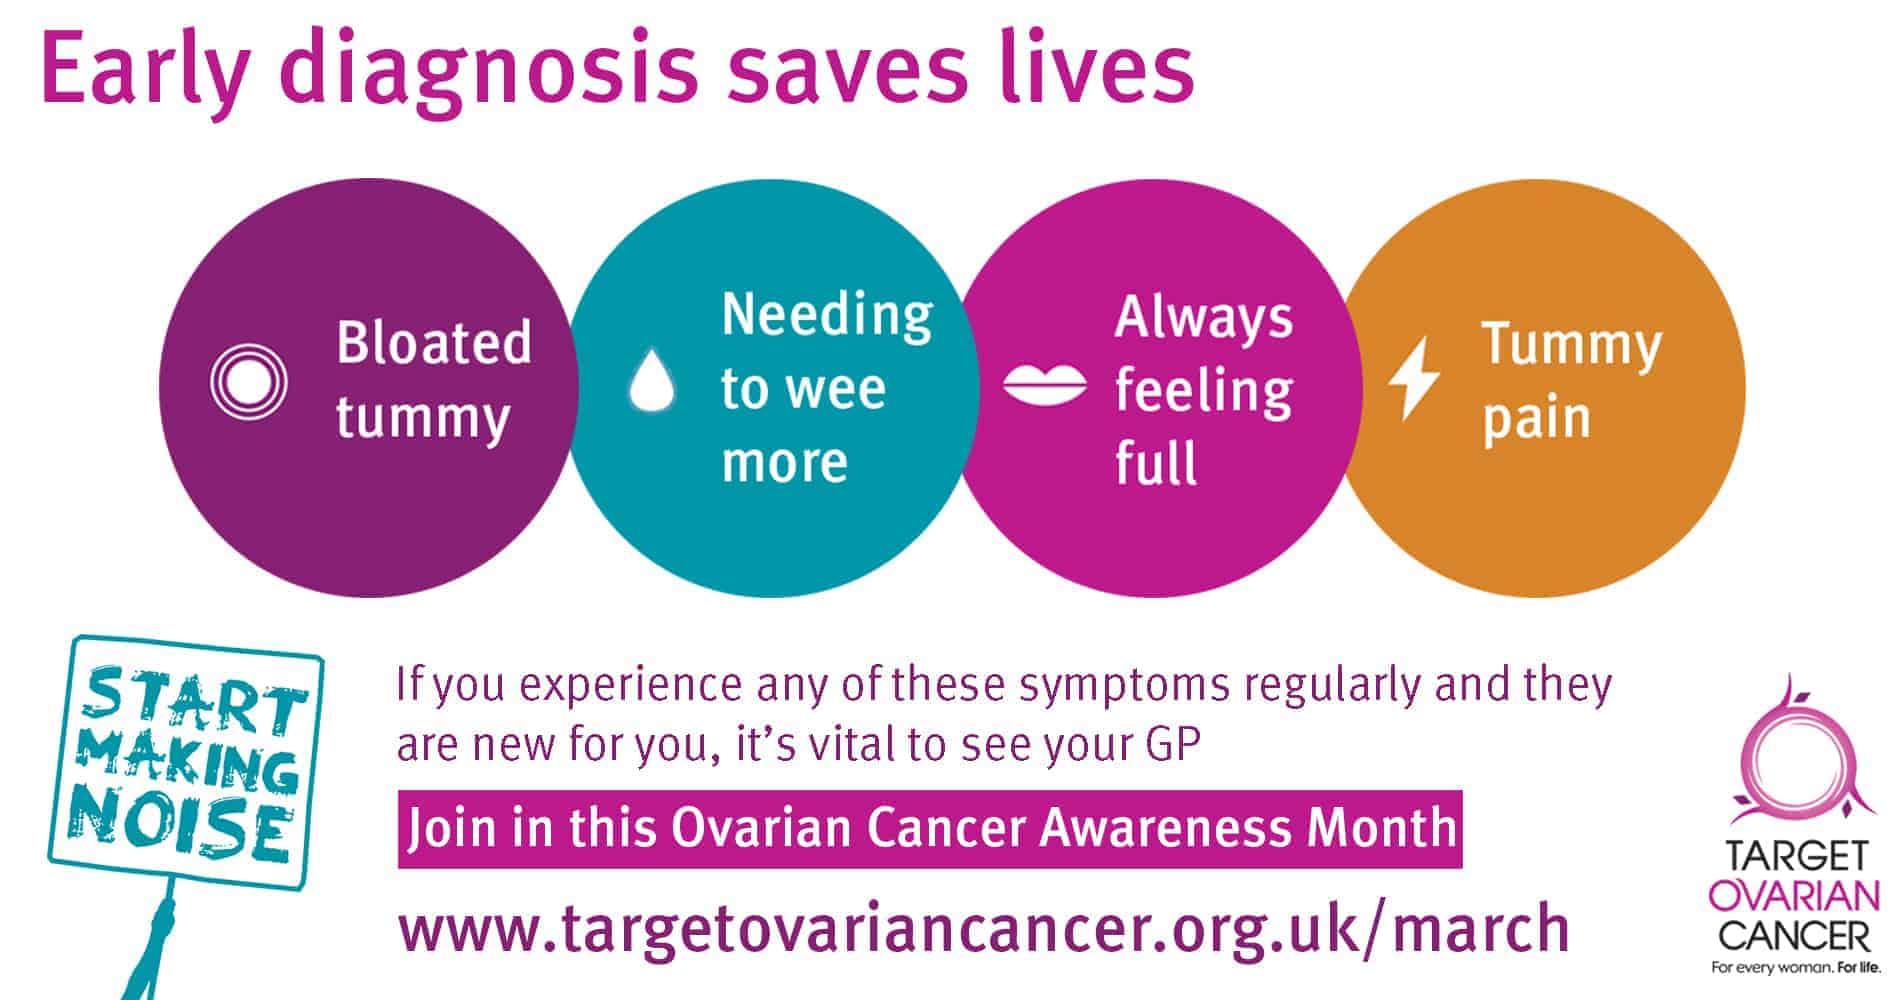 ovarian cancer awareness month 2019 national awareness days events